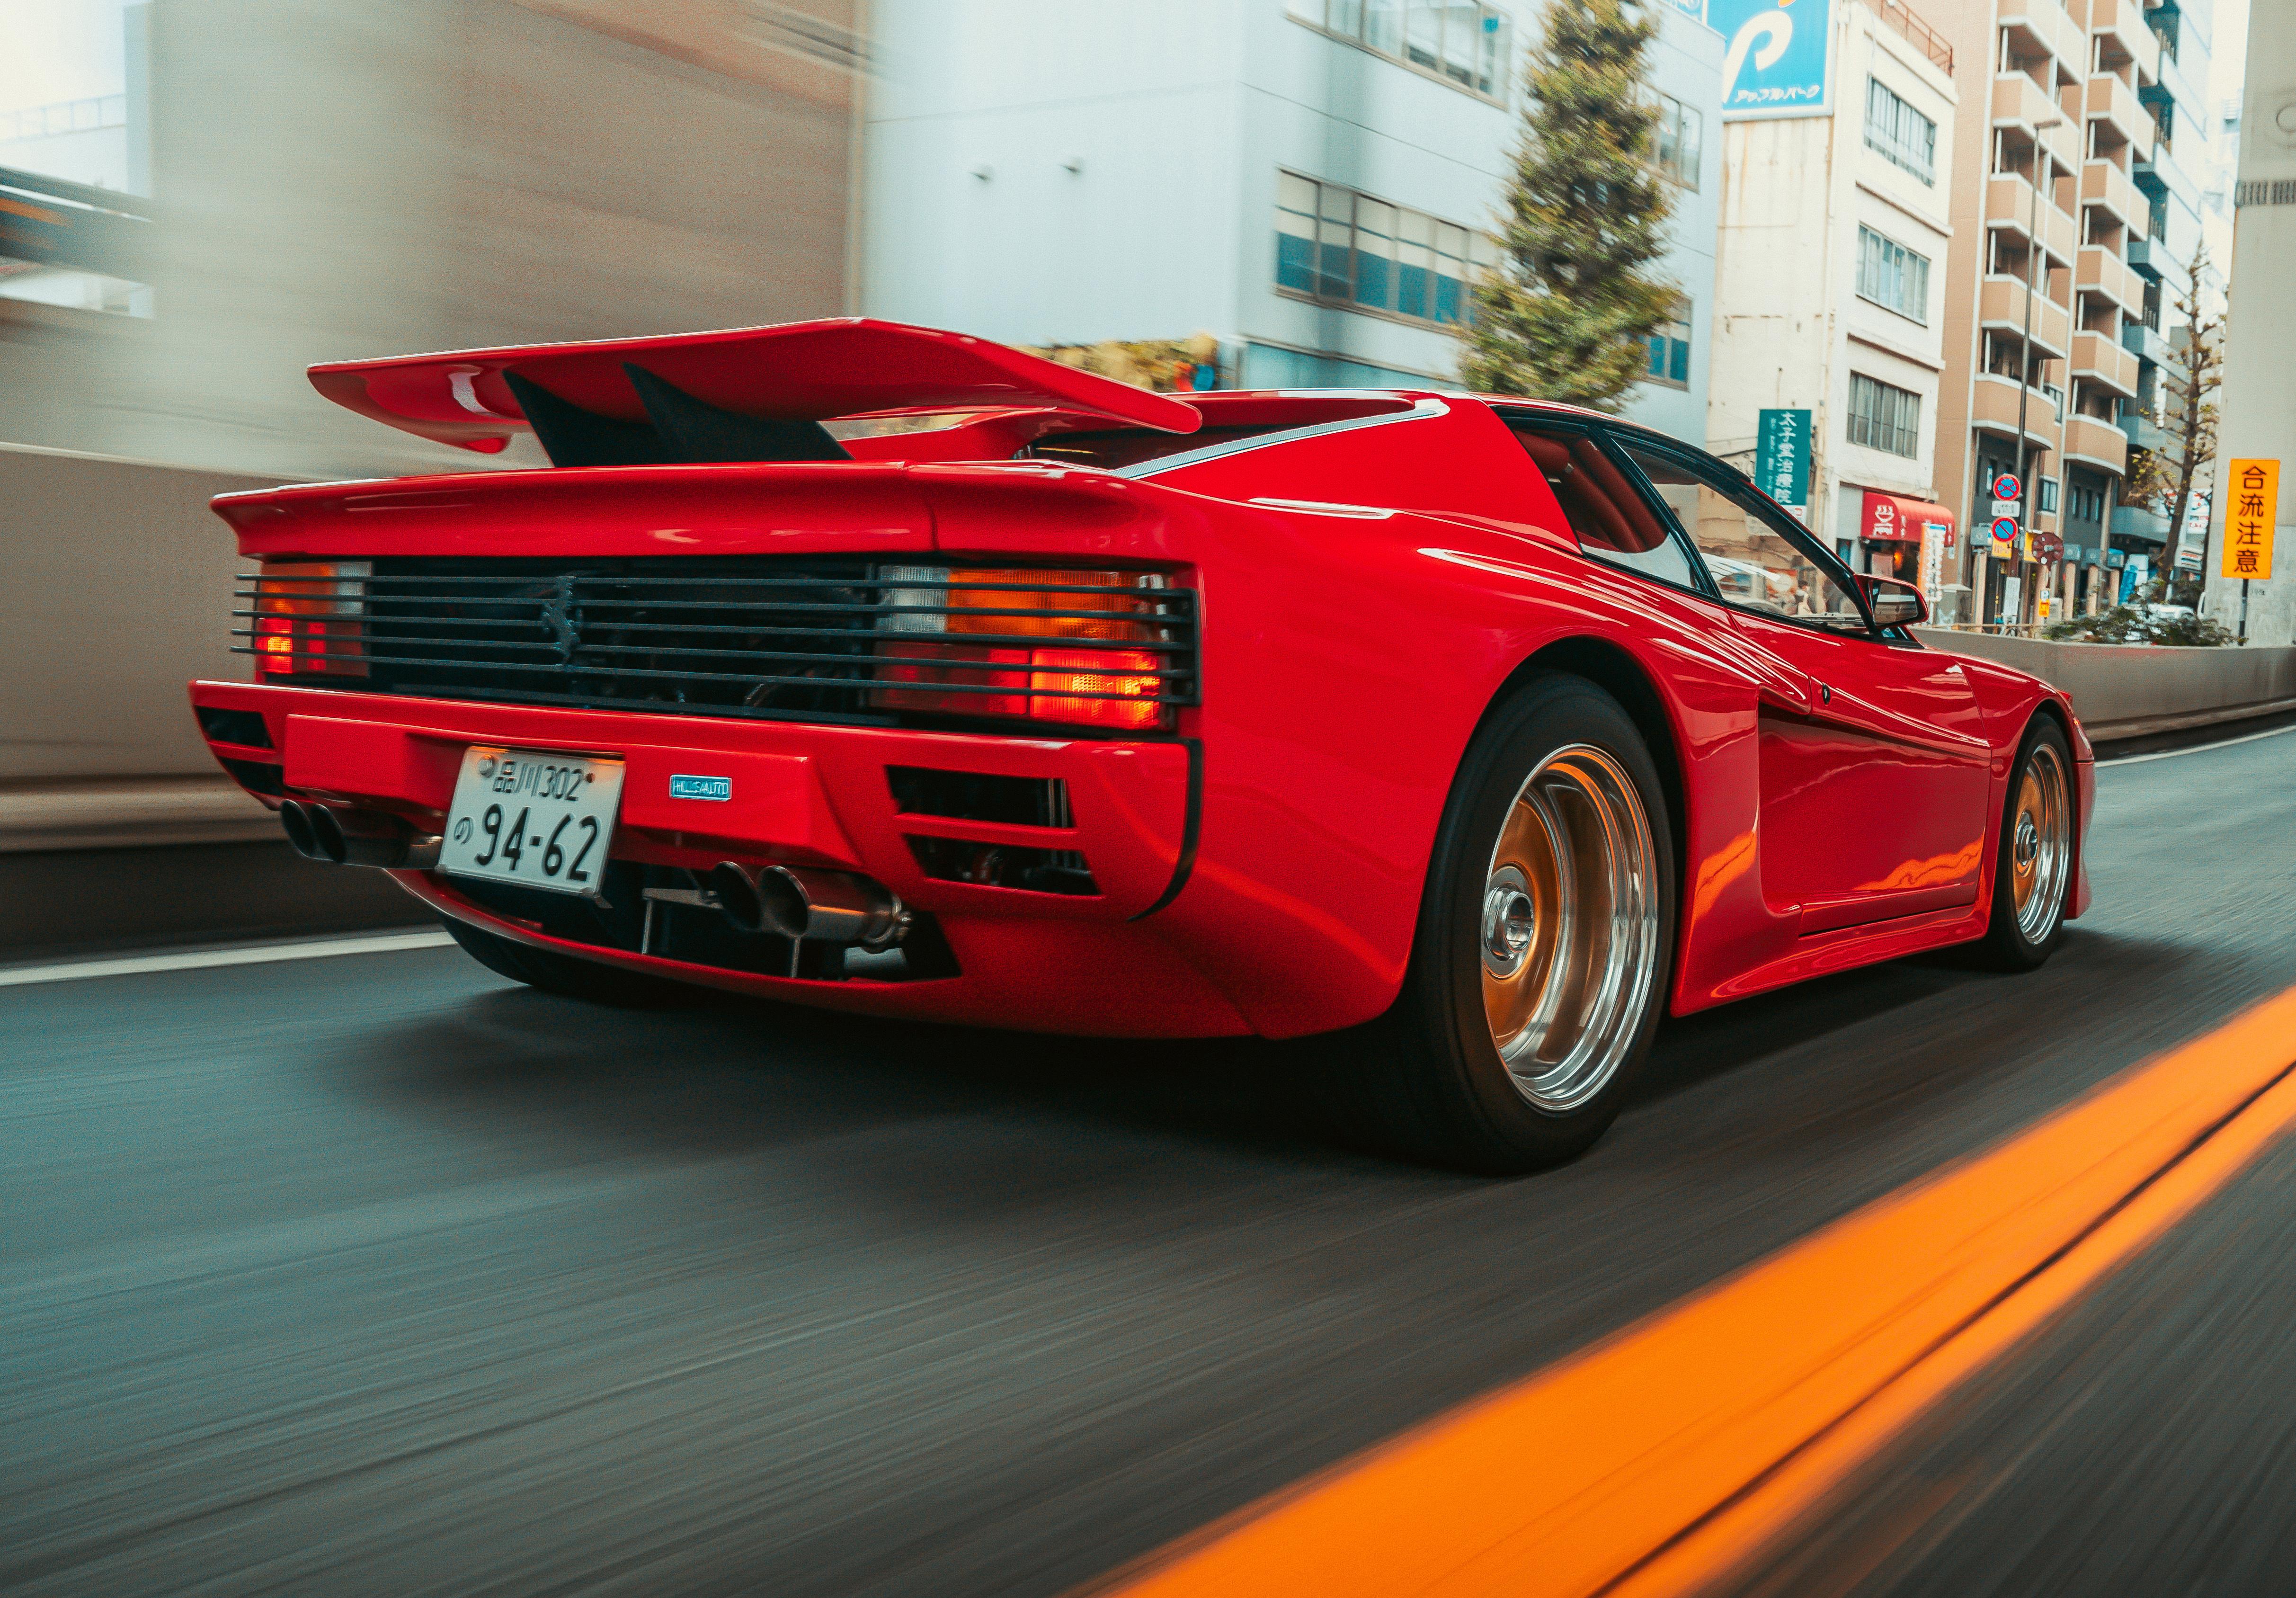 Koenig Ferrari Testarossa Bi Turbo 5k Hd Cars 4k Wallpapers Images Backgrounds Photos And Pictures